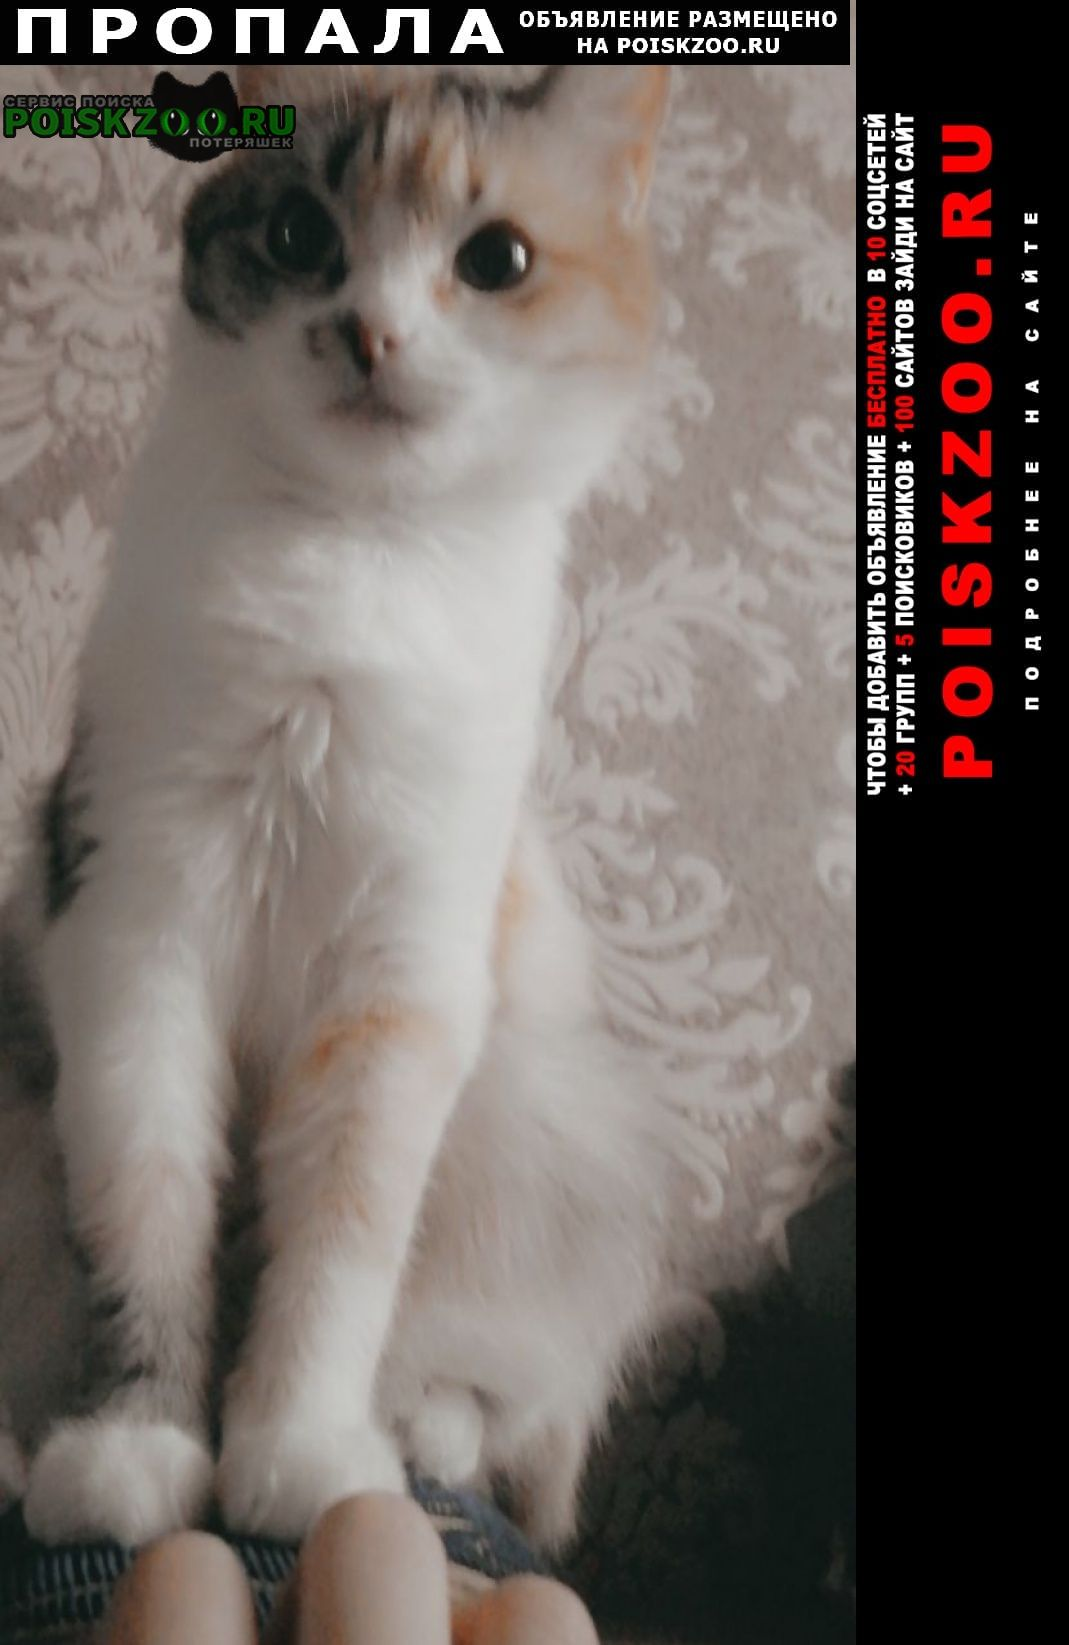 Пропала кошка Каспийск